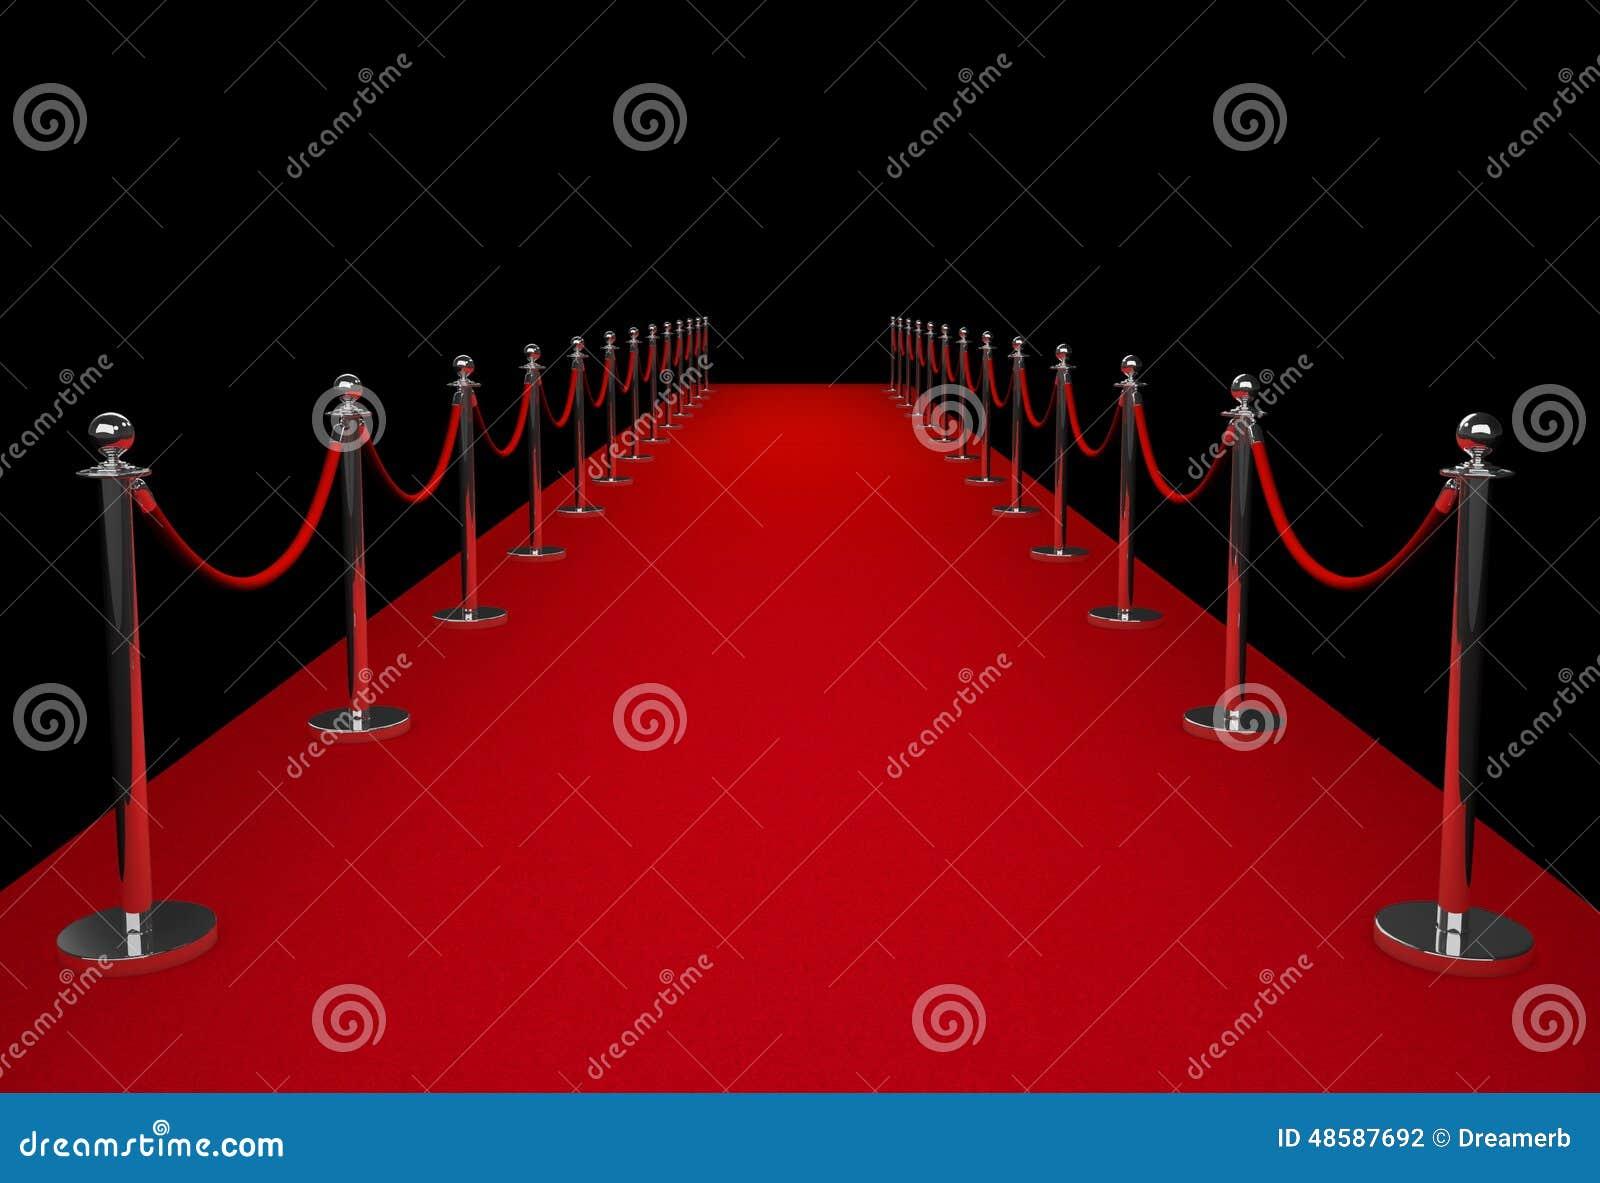 Red Carpet Stock Illustration Image 48587692